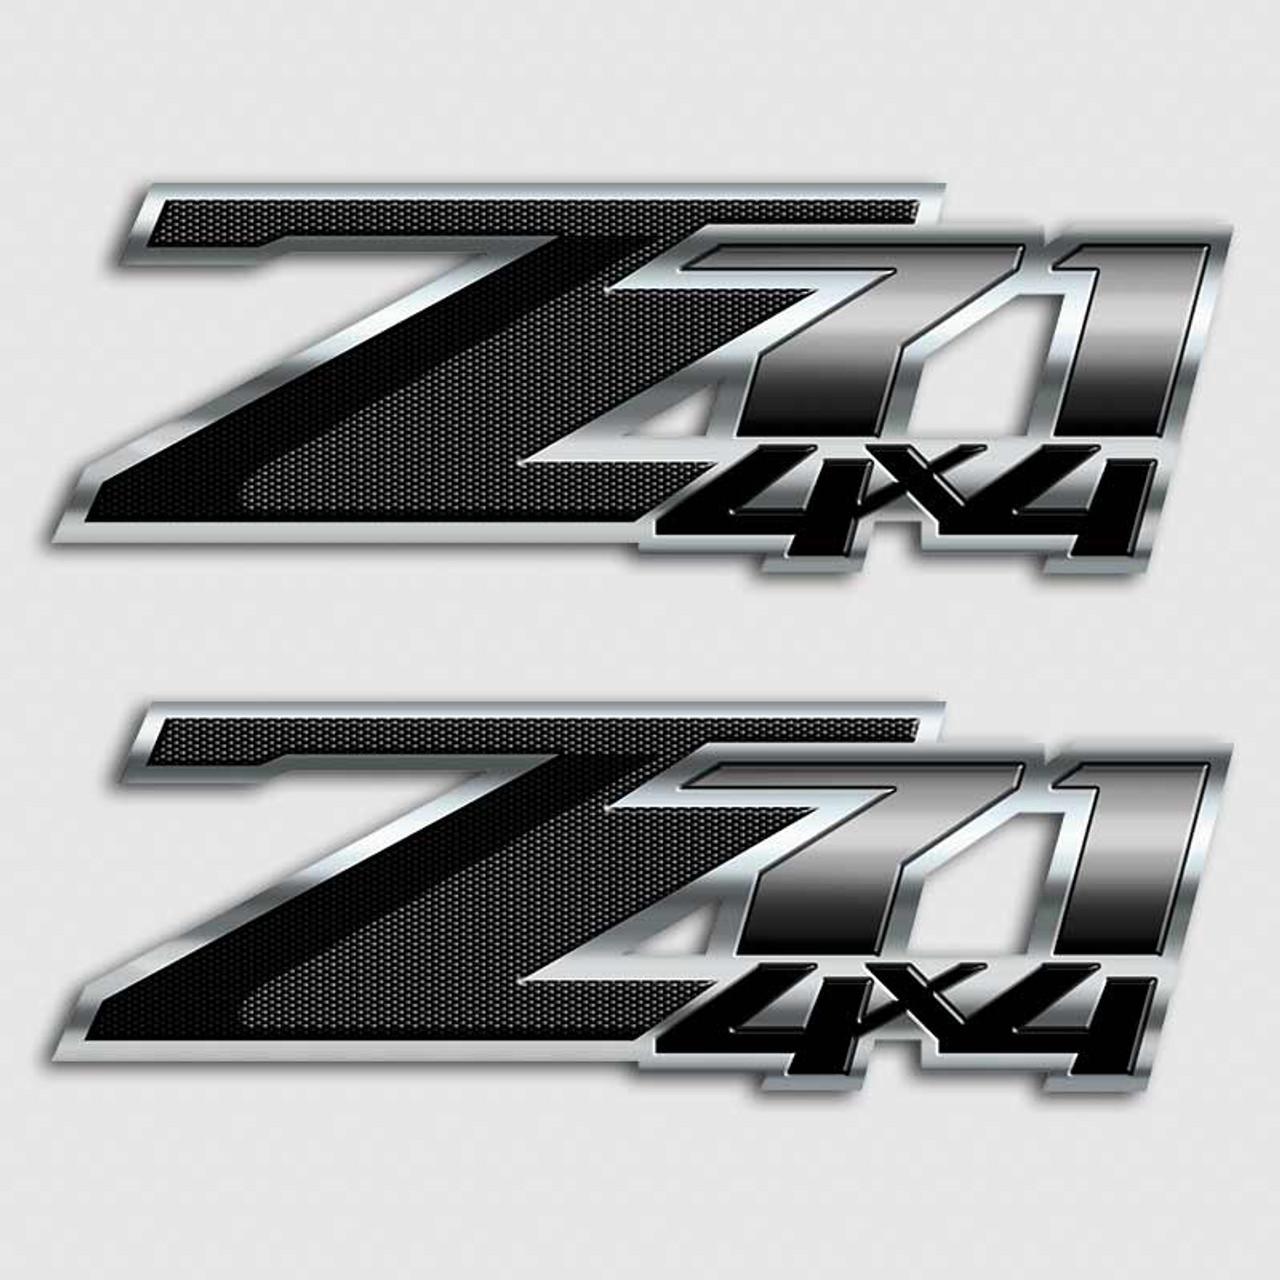 Z71 Black Carbon Fiber Silverado Truck Decal Chevy Gmc